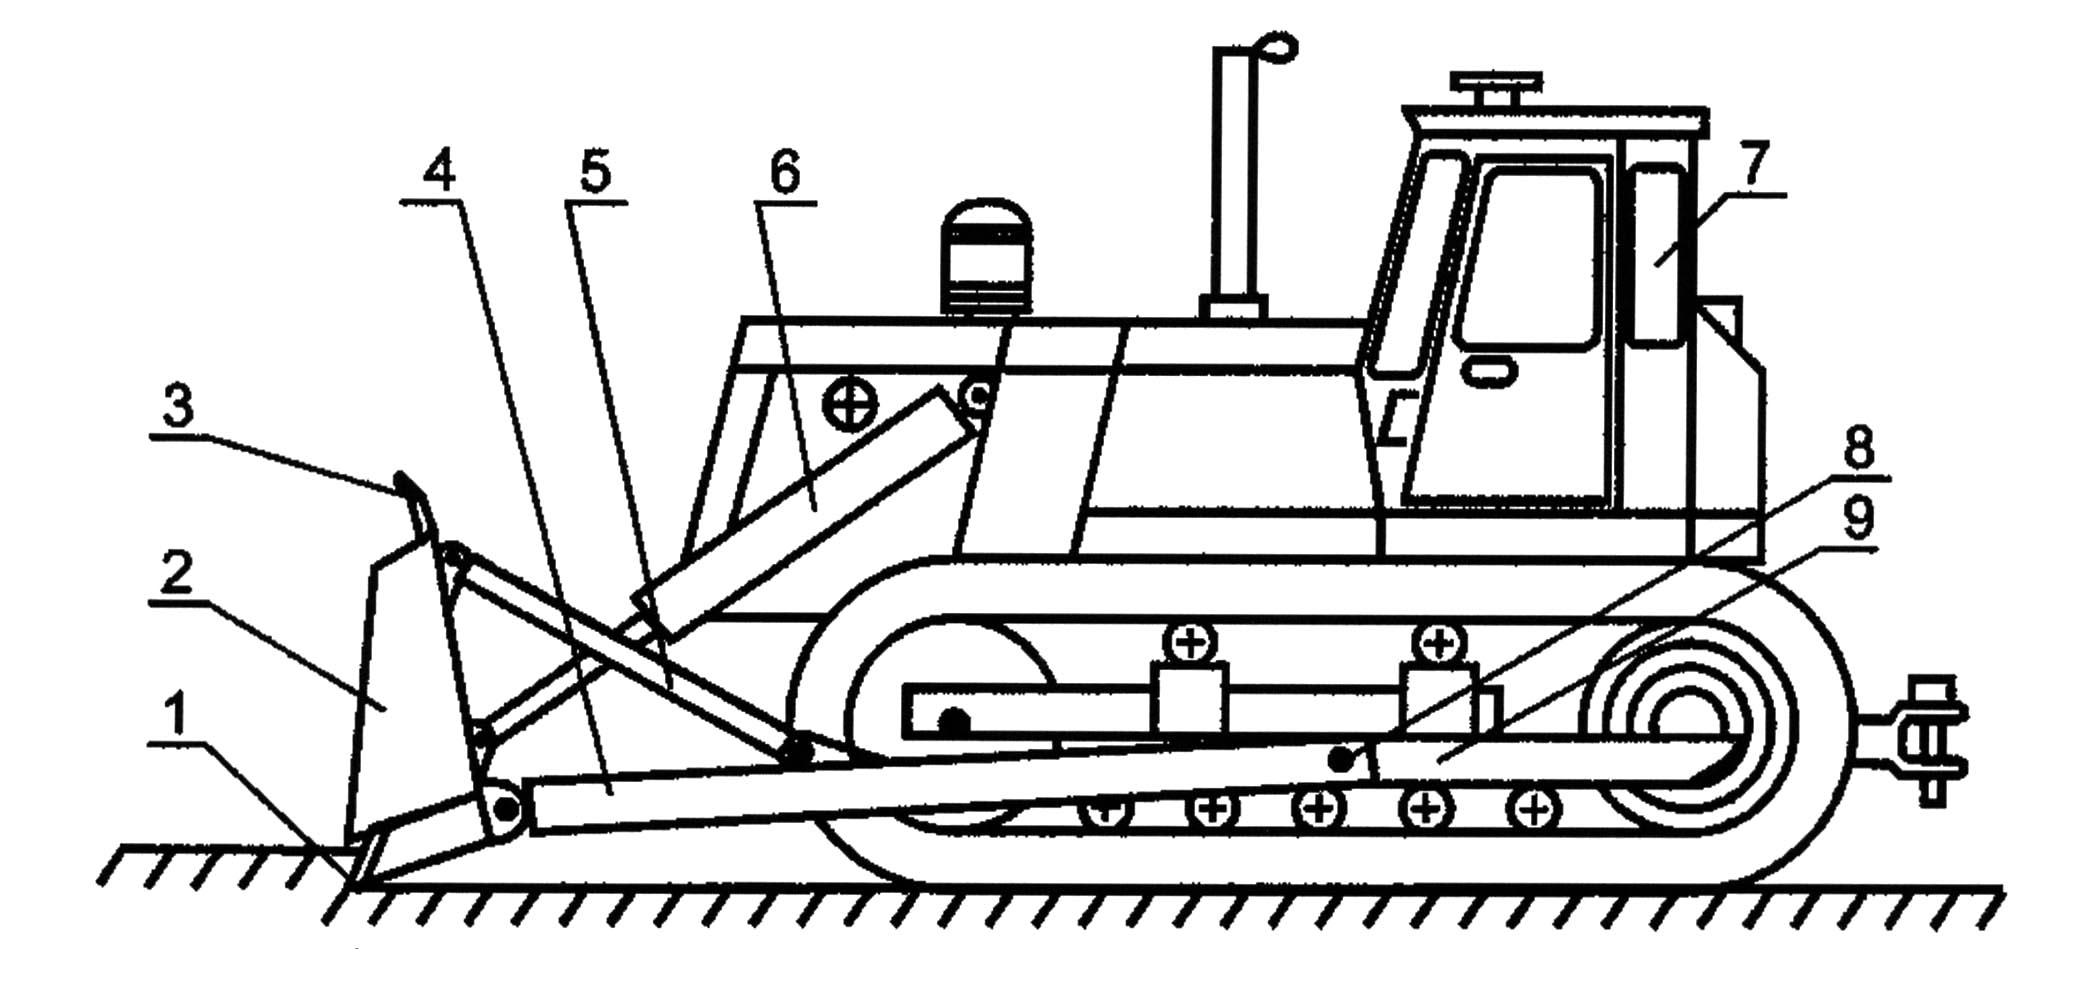 Схема бульдозера чертеж